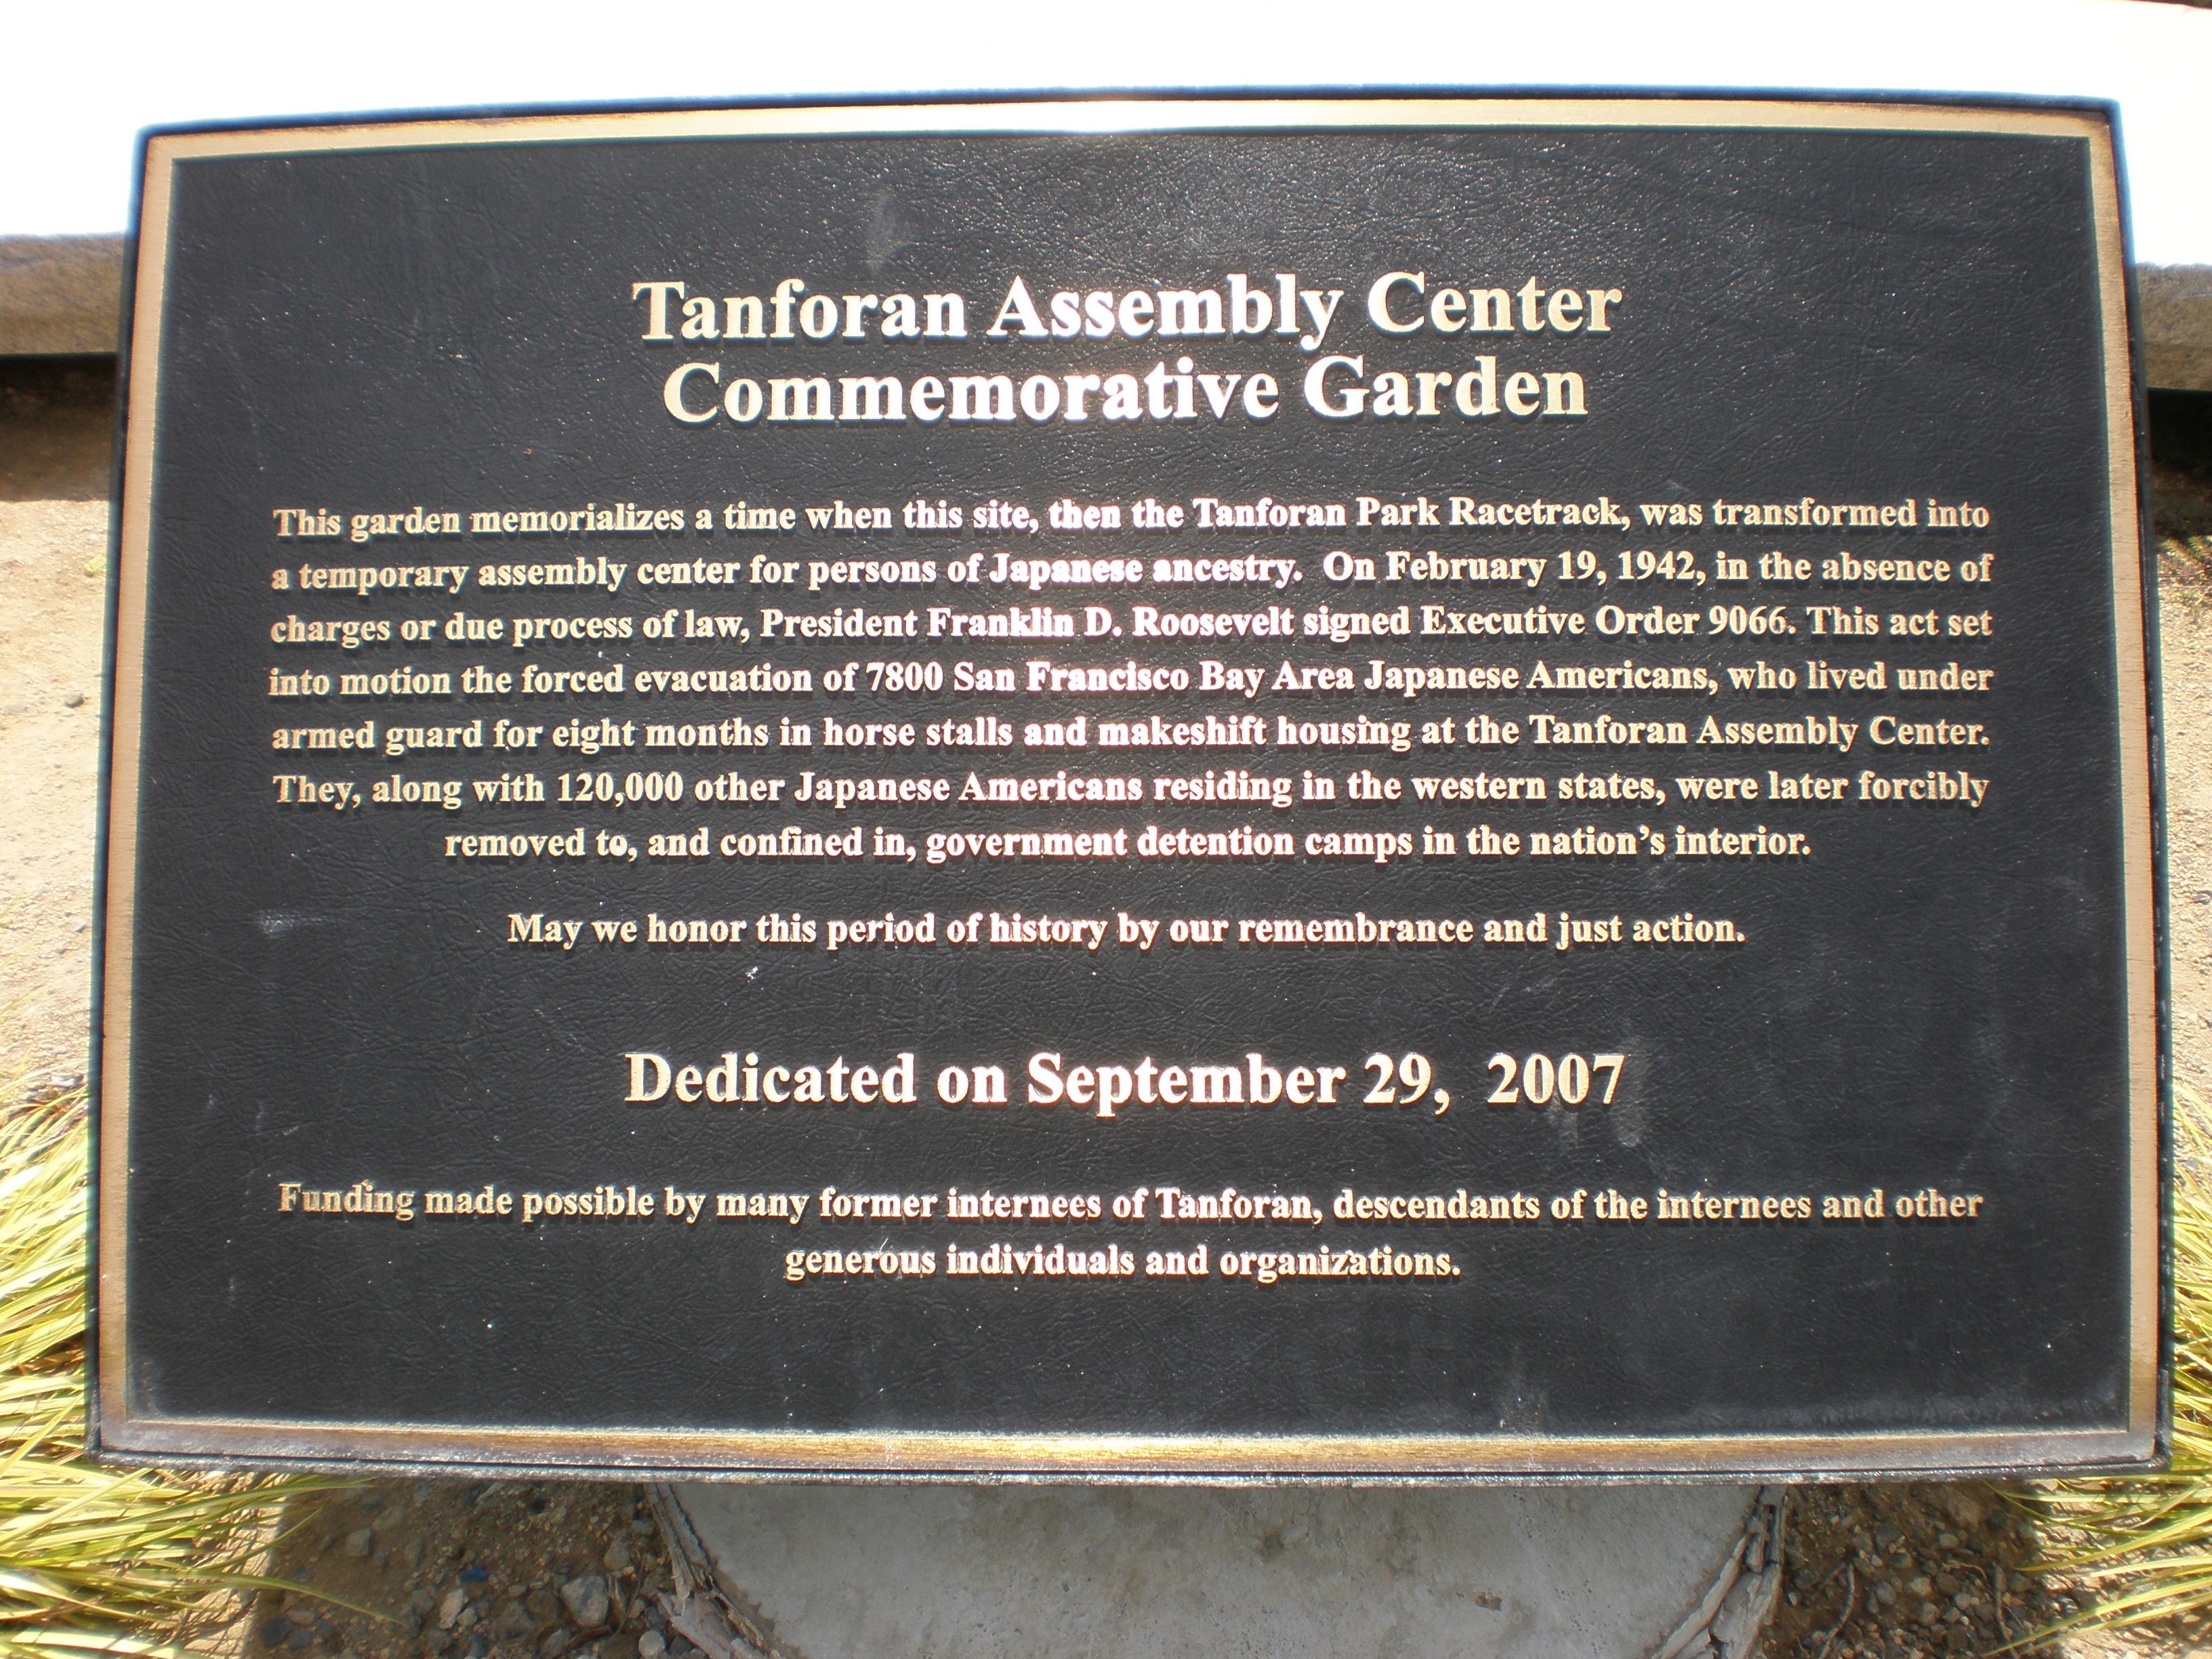 FileShops at Tanforan Commemorative Garden plaqueJPG Wikimedia